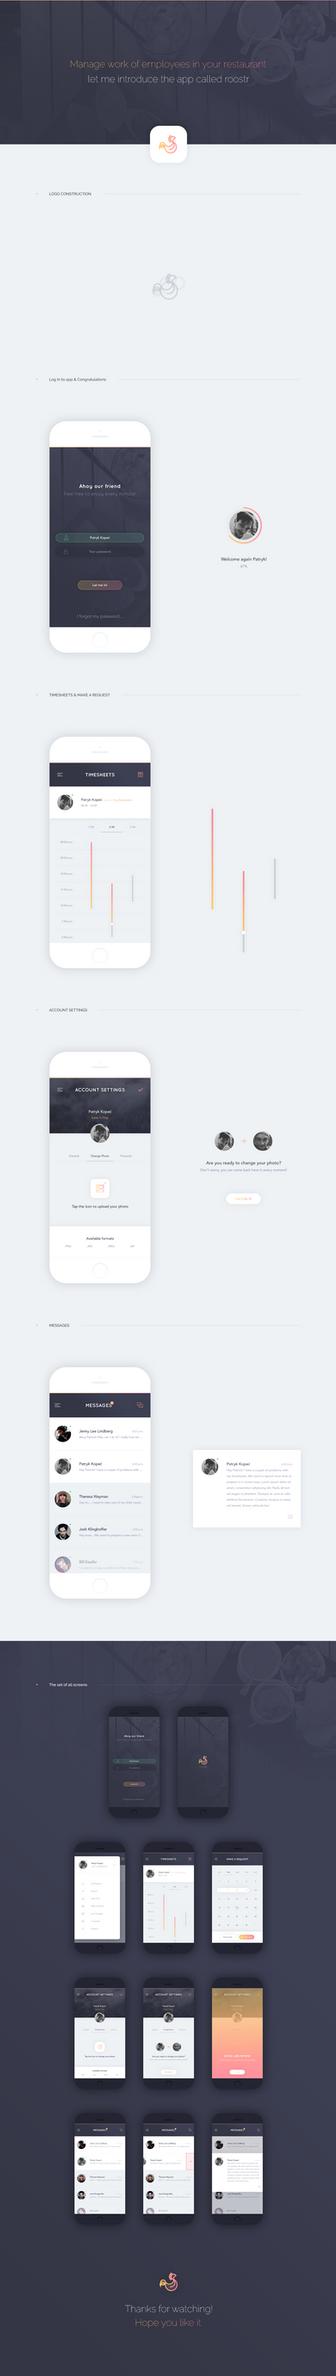 Roostr - Mobile App by encore13